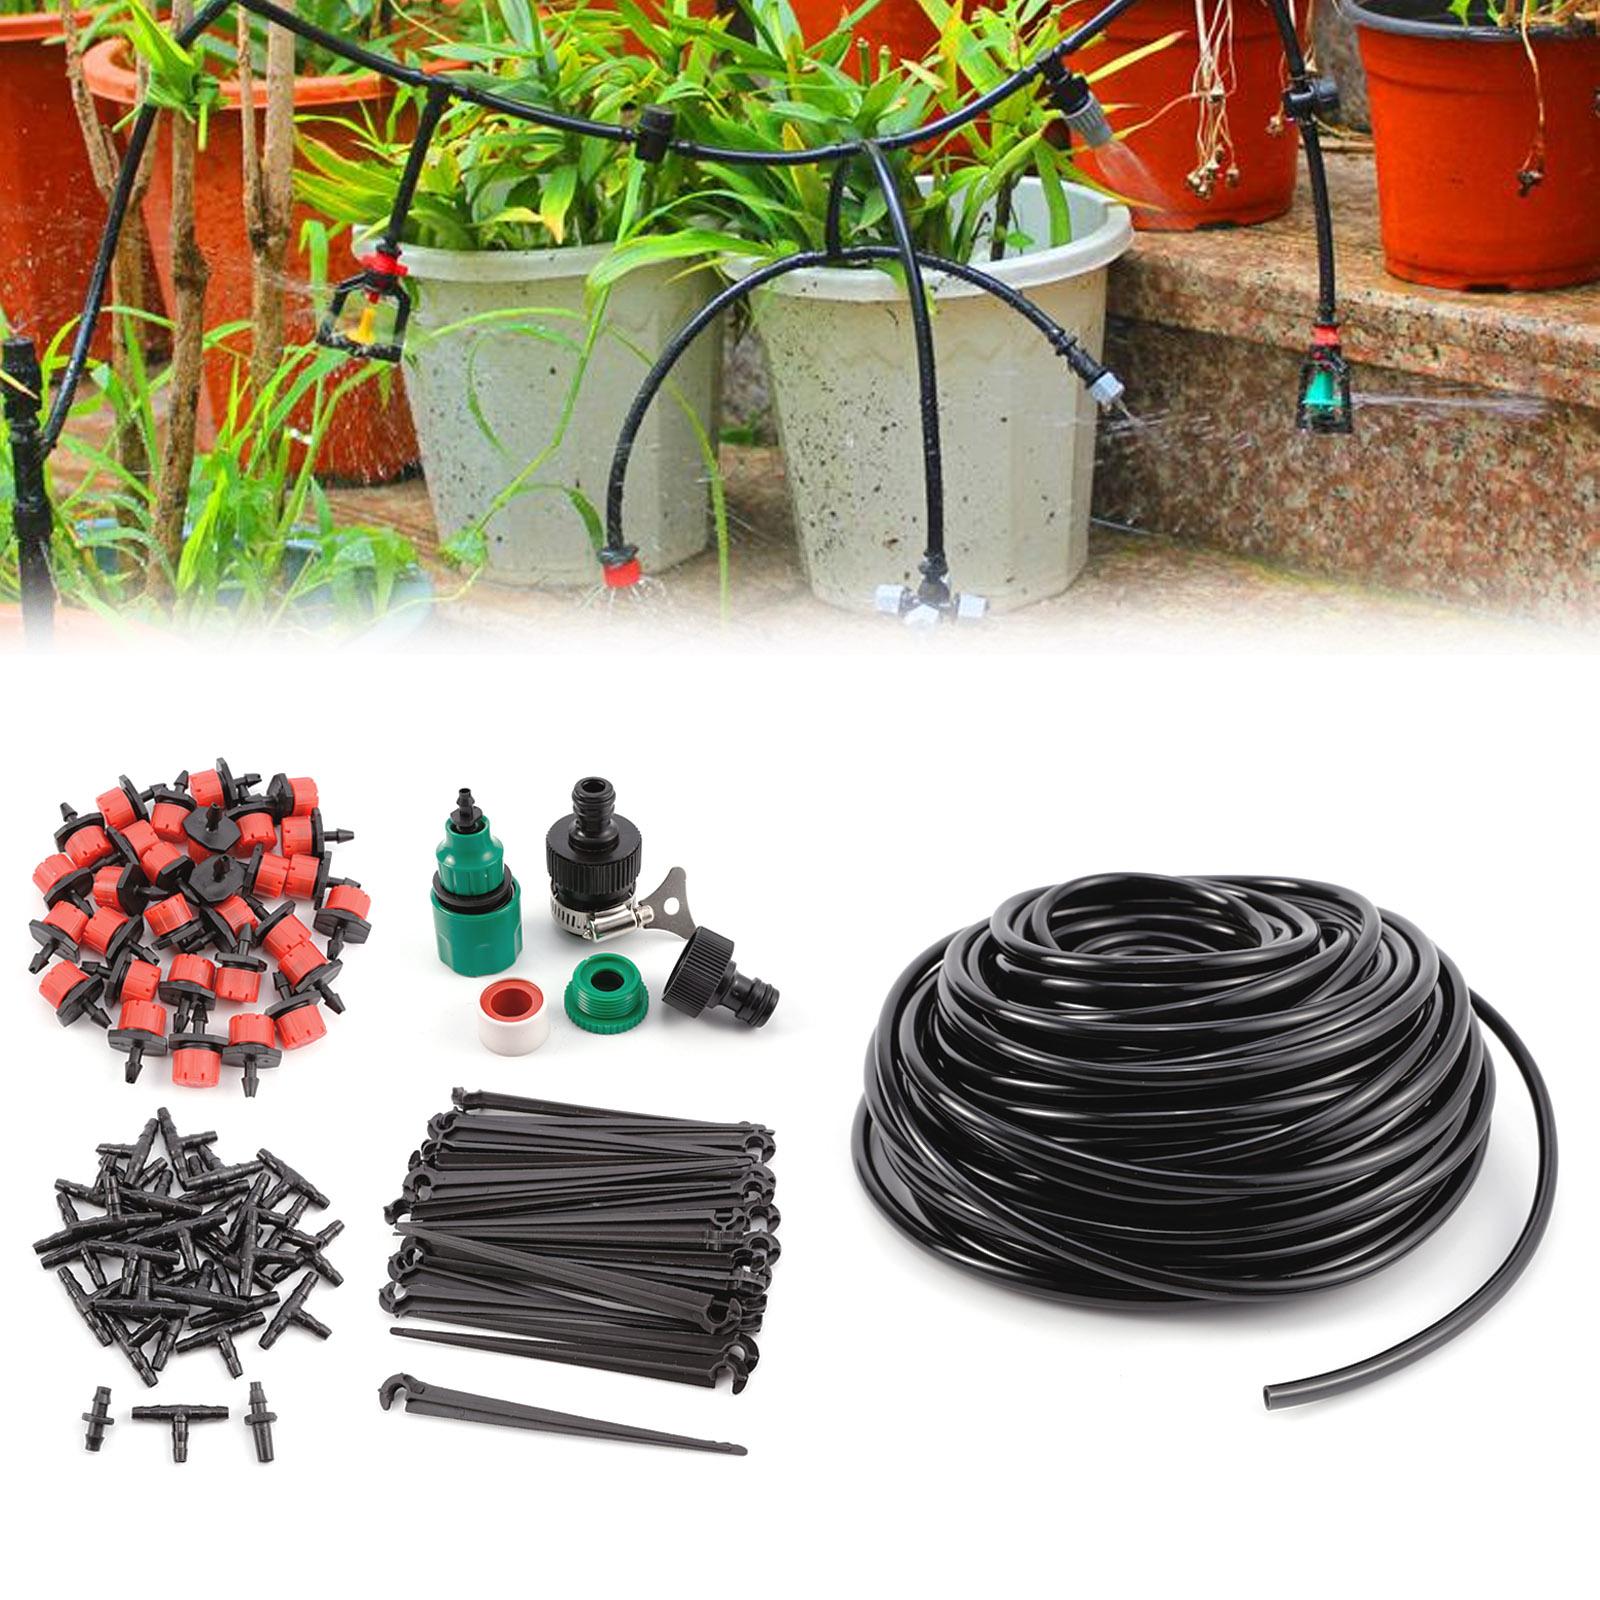 Bewässerung Kit Schlauch für Bewässerungssystem DIY Garten Teressse Balkon 50m